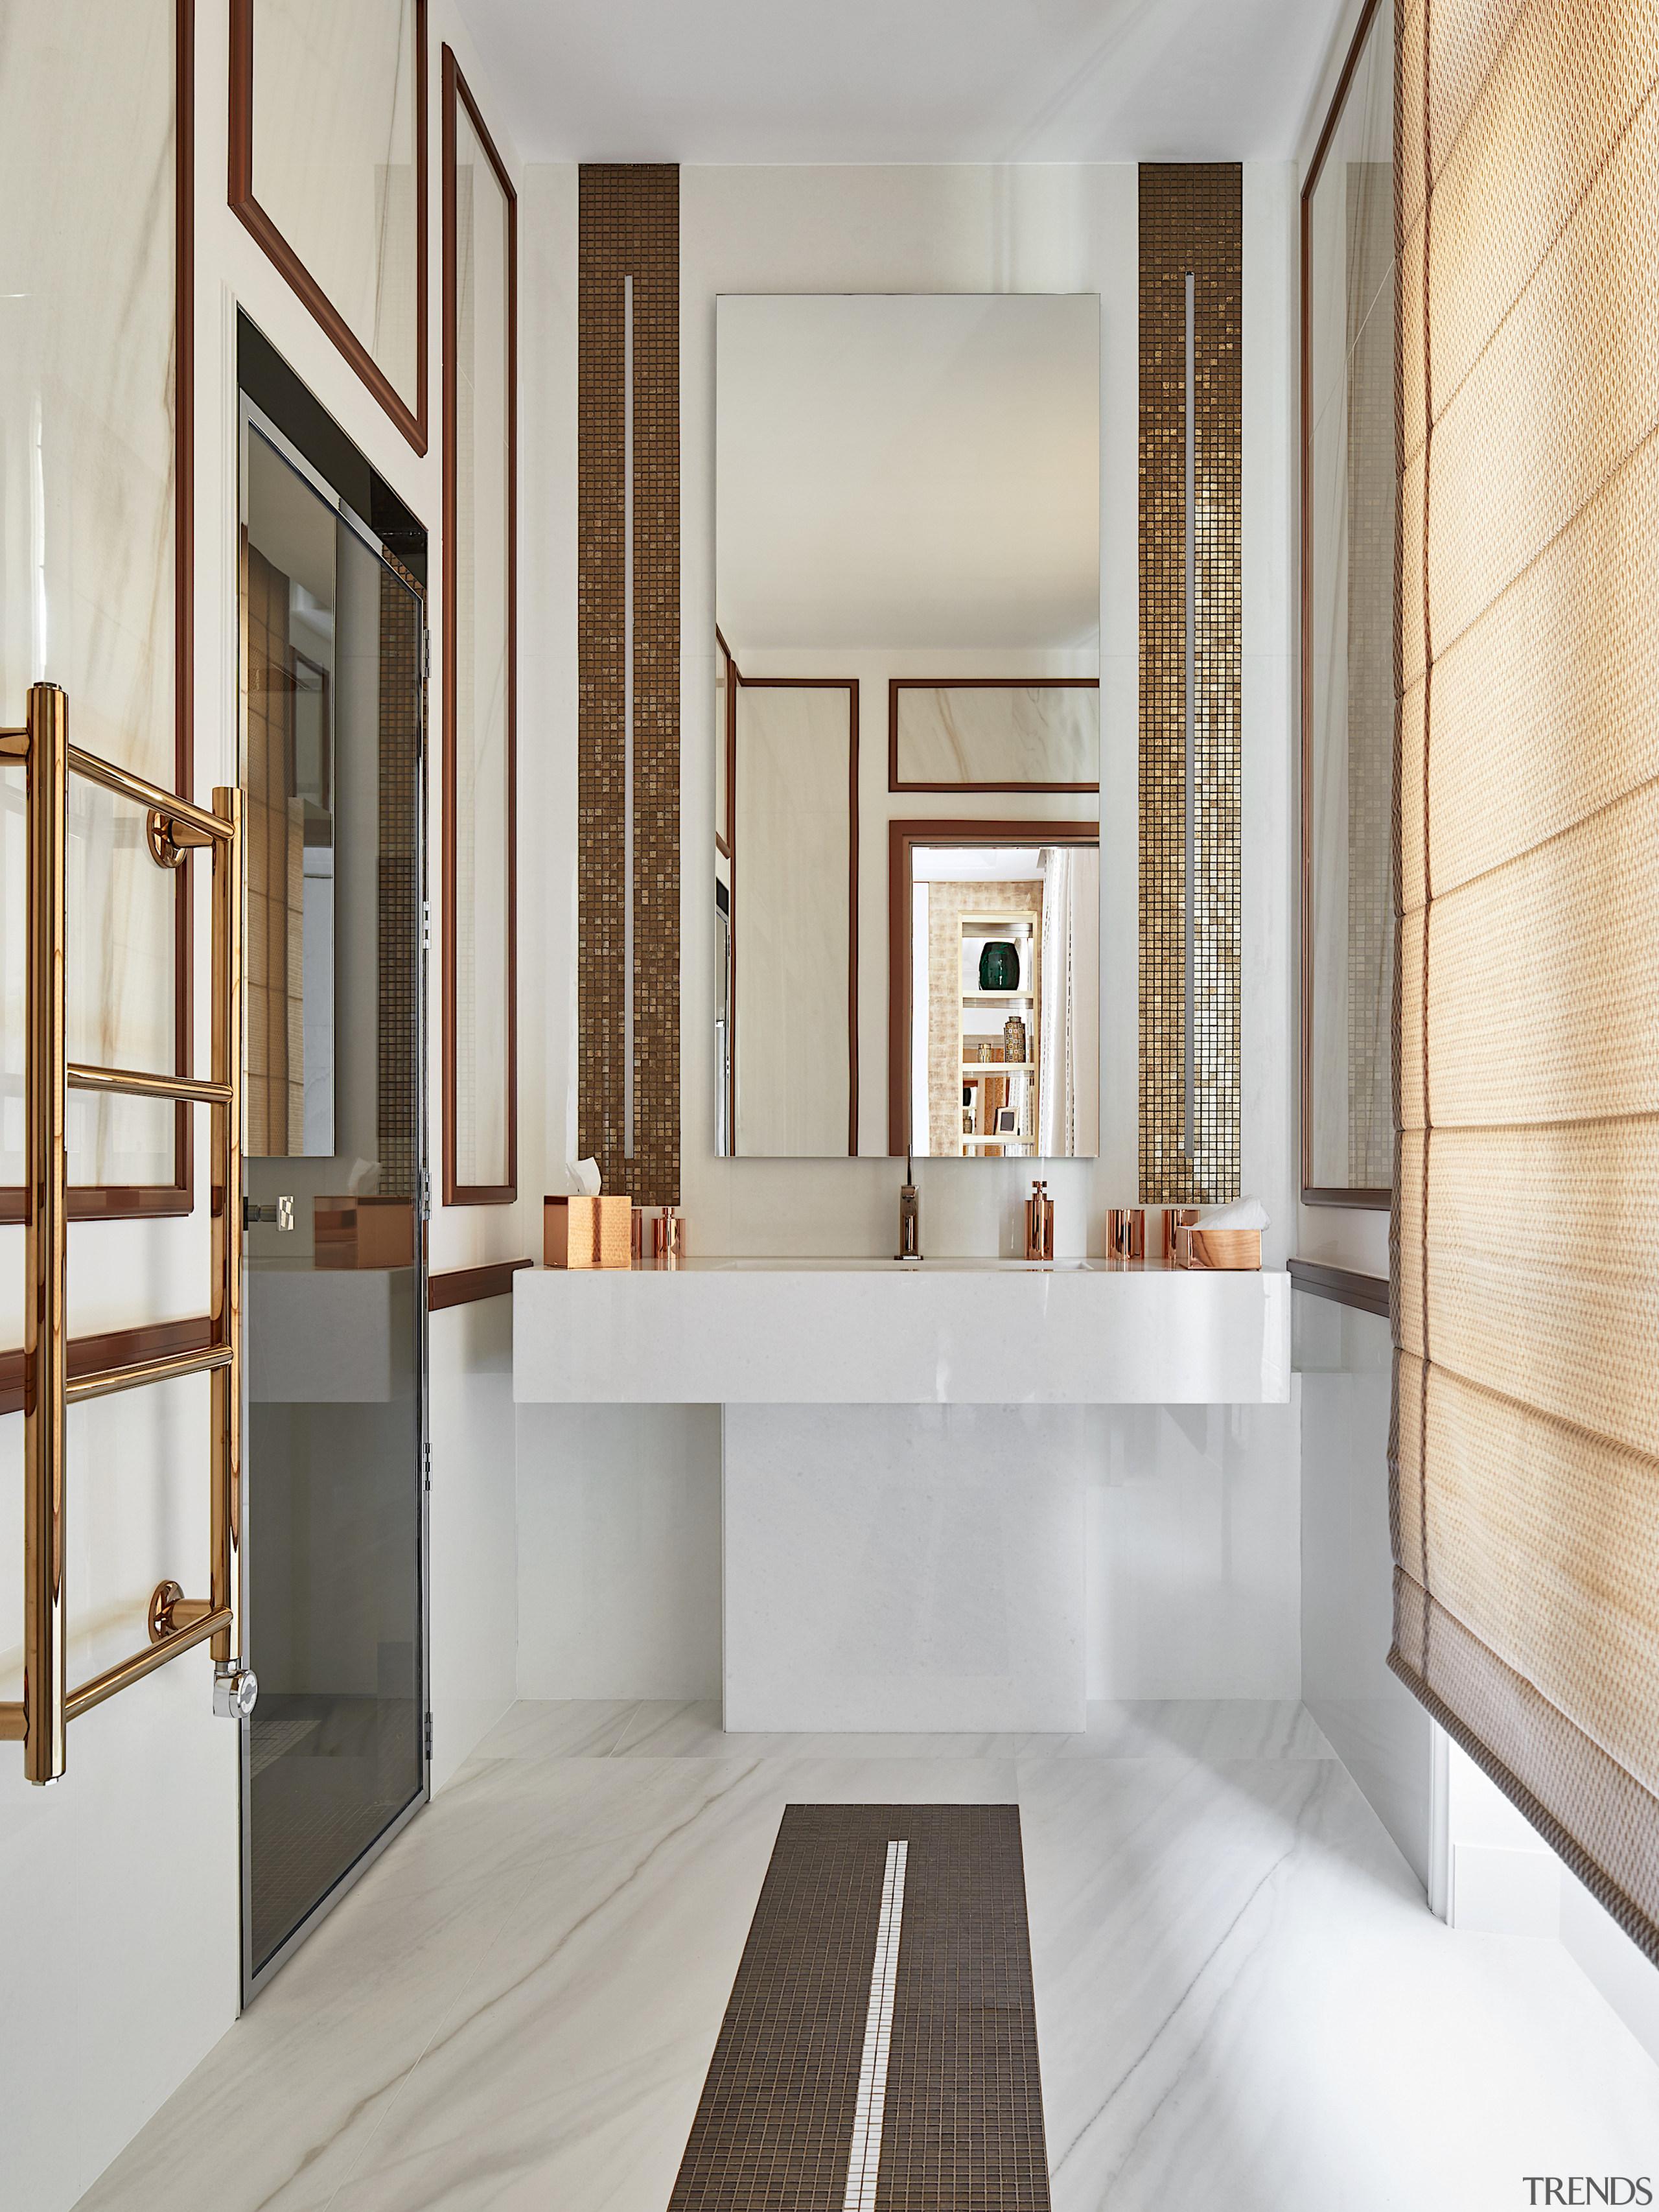 This bathroom celebrates a harmonic balance between marble gray